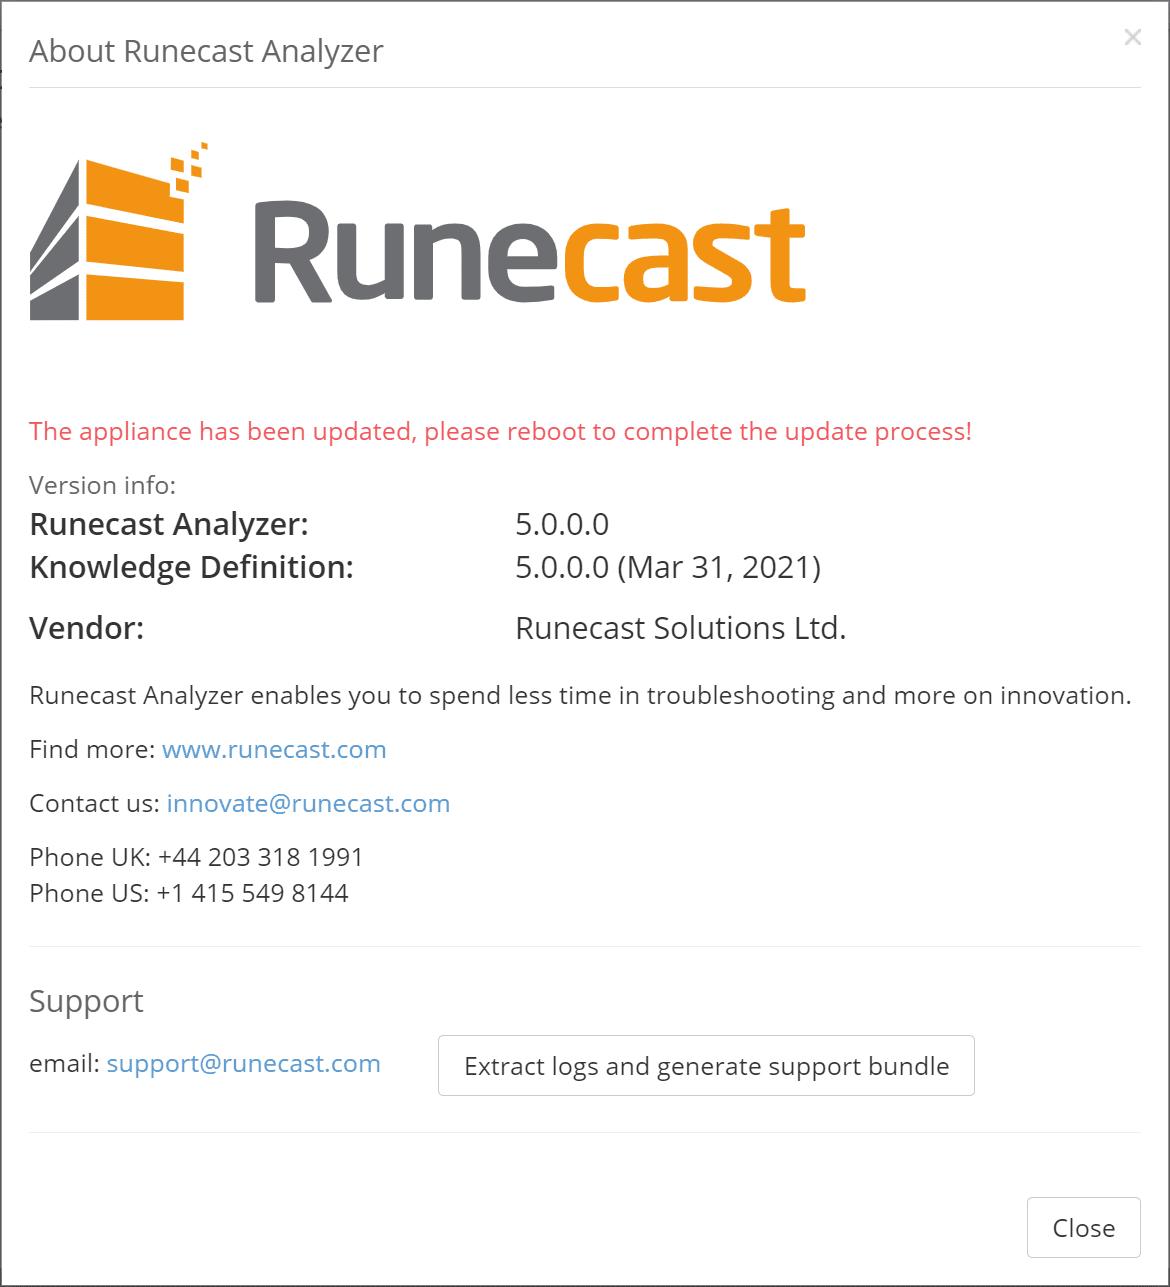 Upgrading to runecast analyzer 5.0